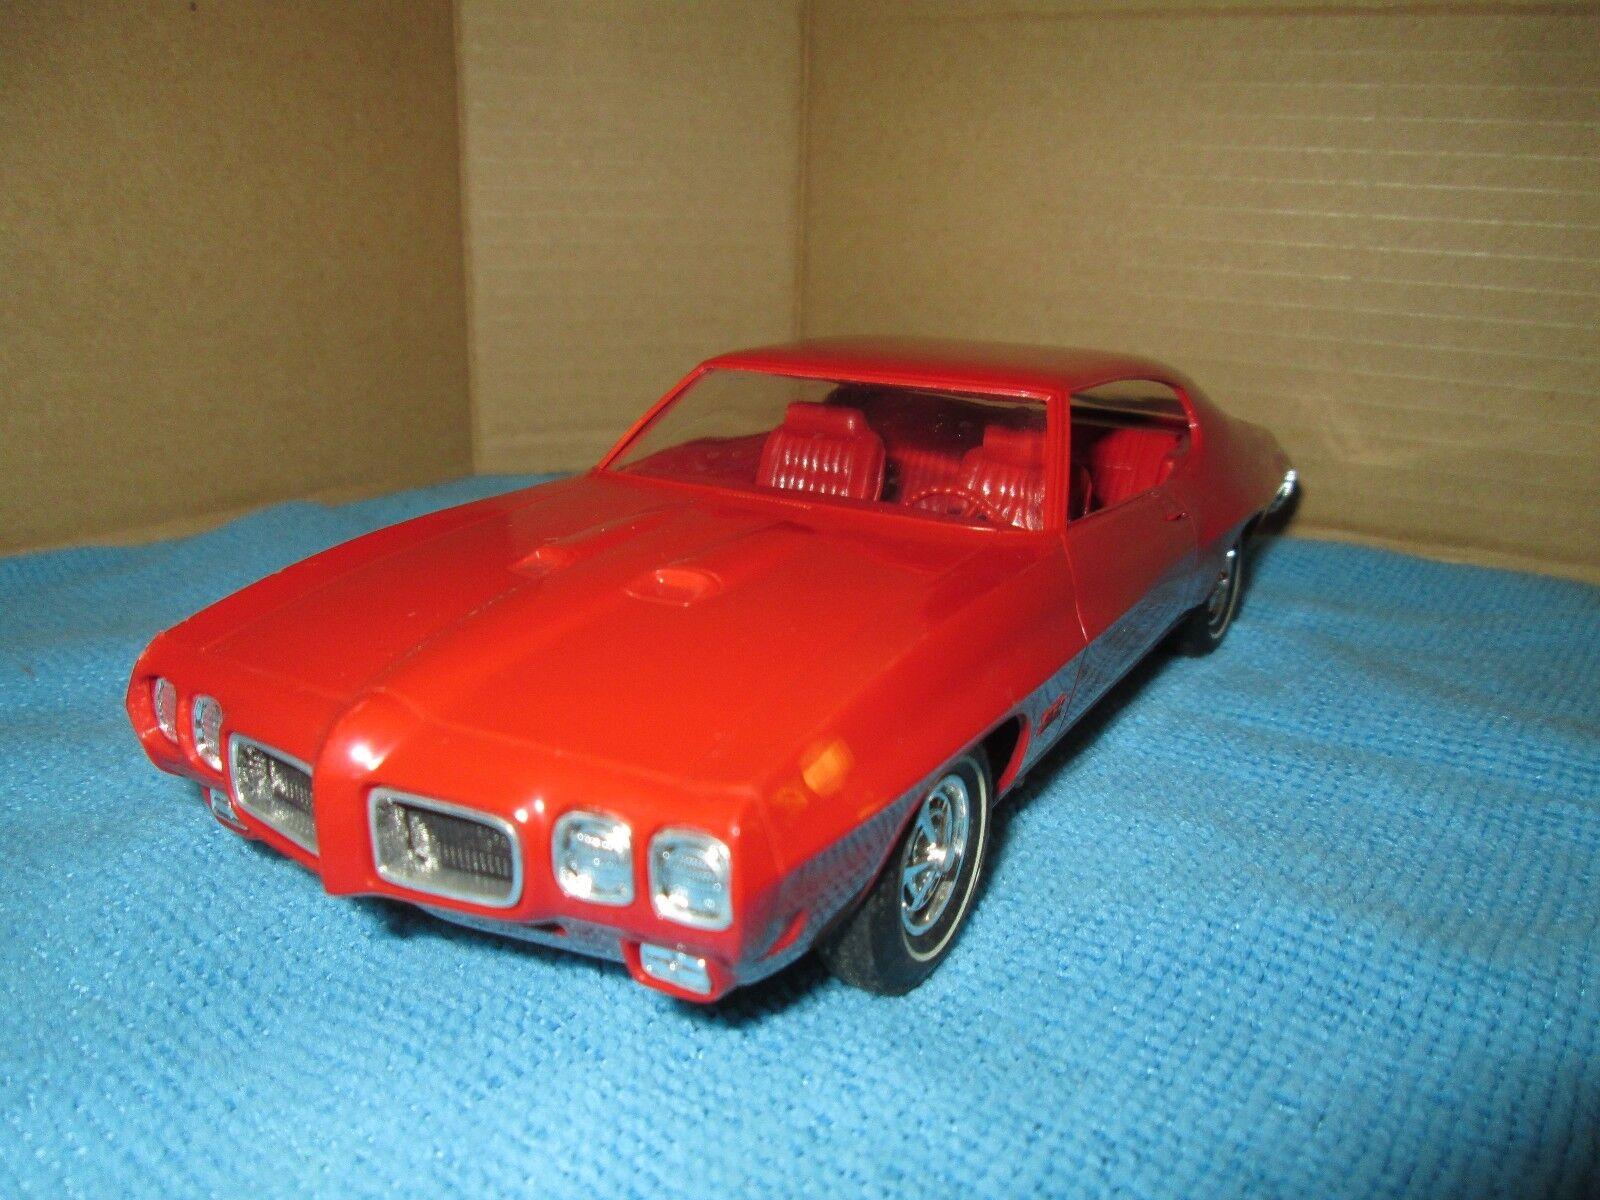 1970 Pontiac Gto Lemans Eimer Konsole Rallye Locker Händler Promo rot 1 25